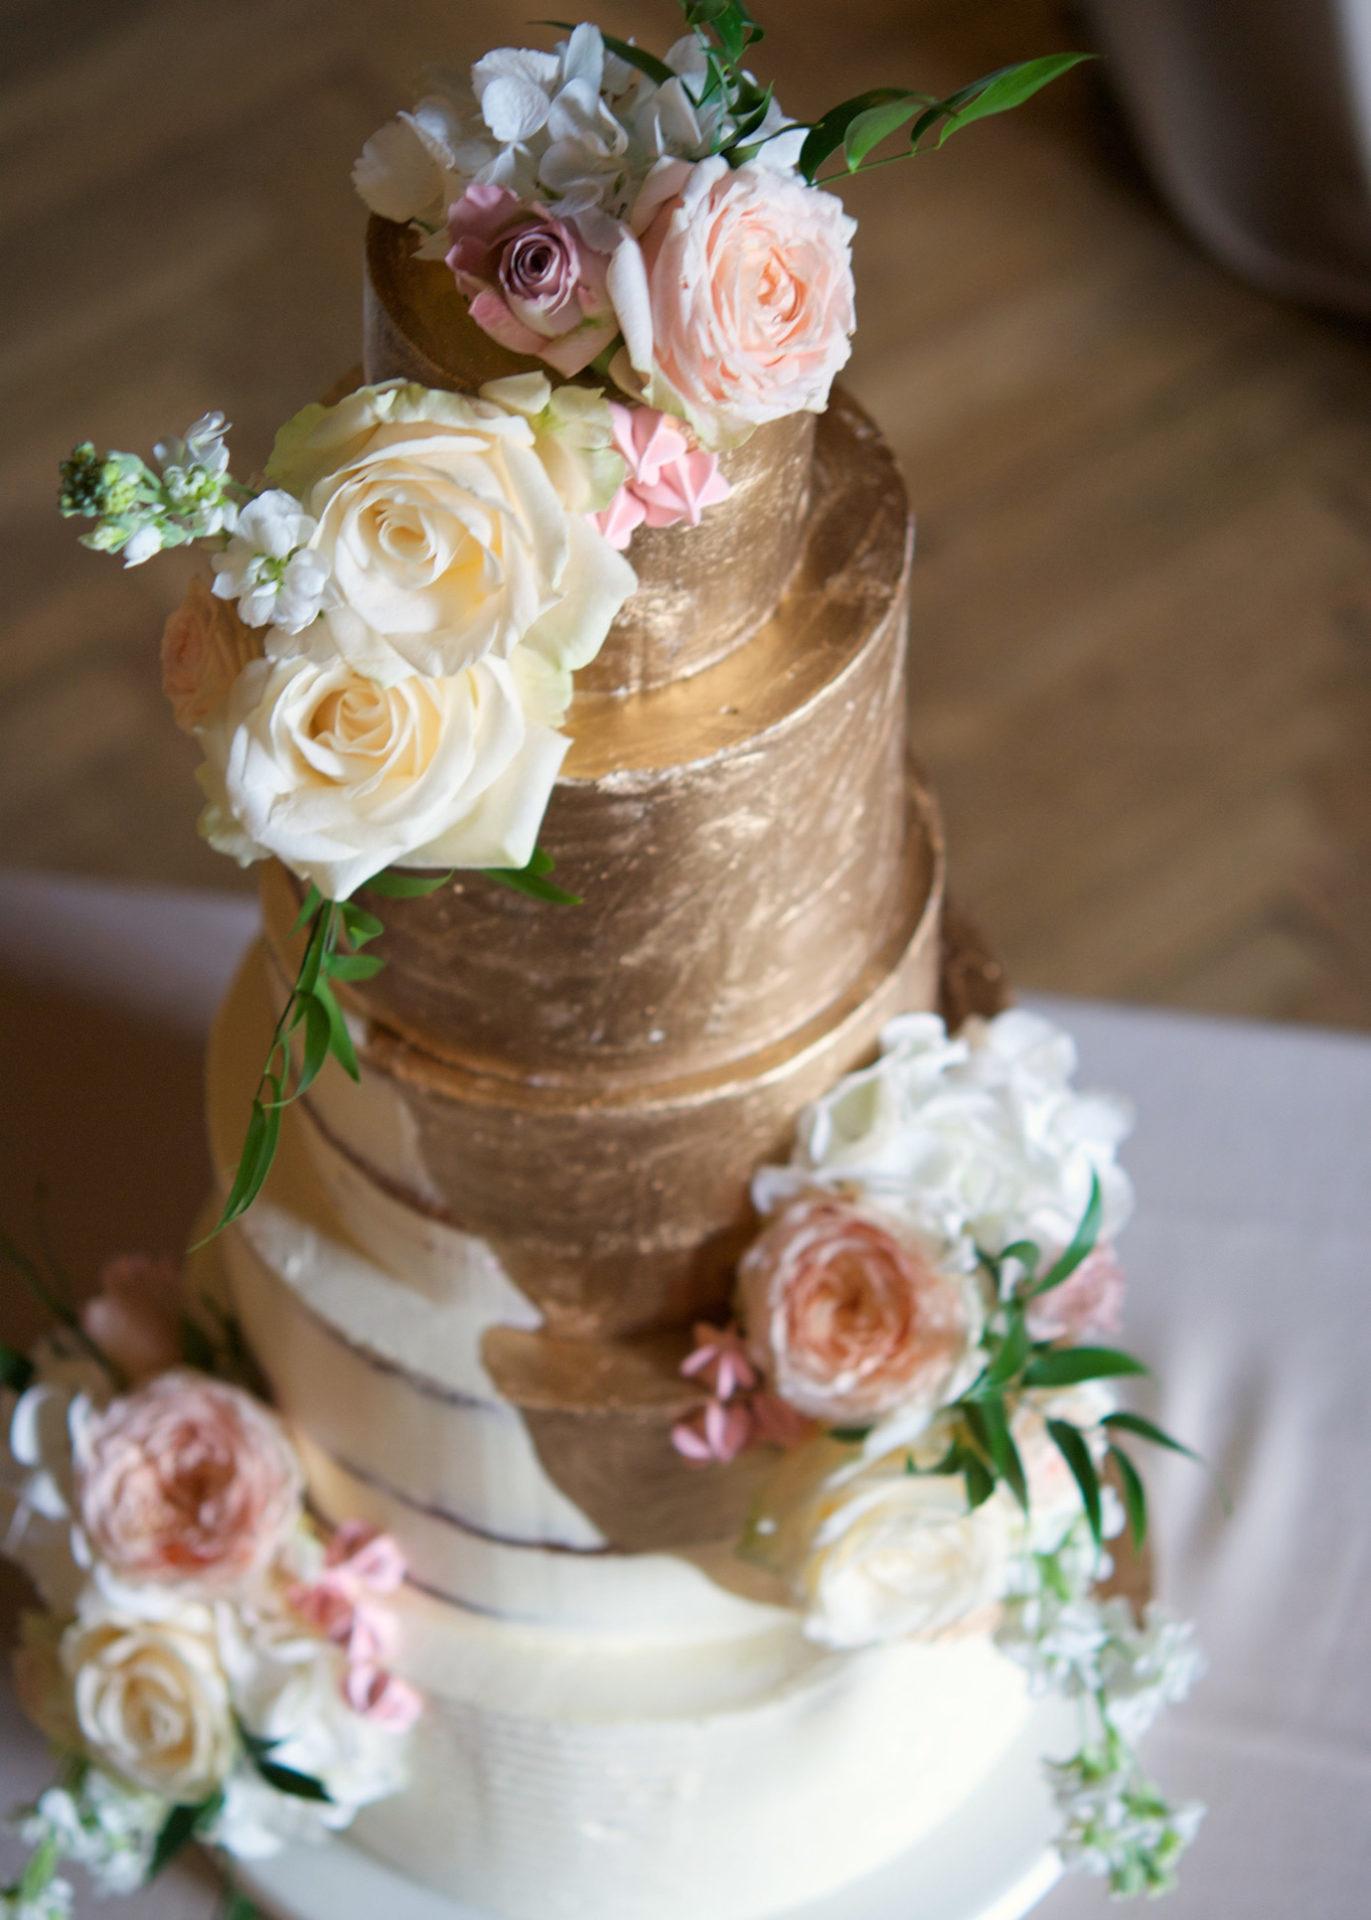 Master class tartas naked cake, tartas para eventos, gold wedding, fresh flowers, mericakes, tartas de boda, wedding cake, curso de reposteria, barcelona, 2